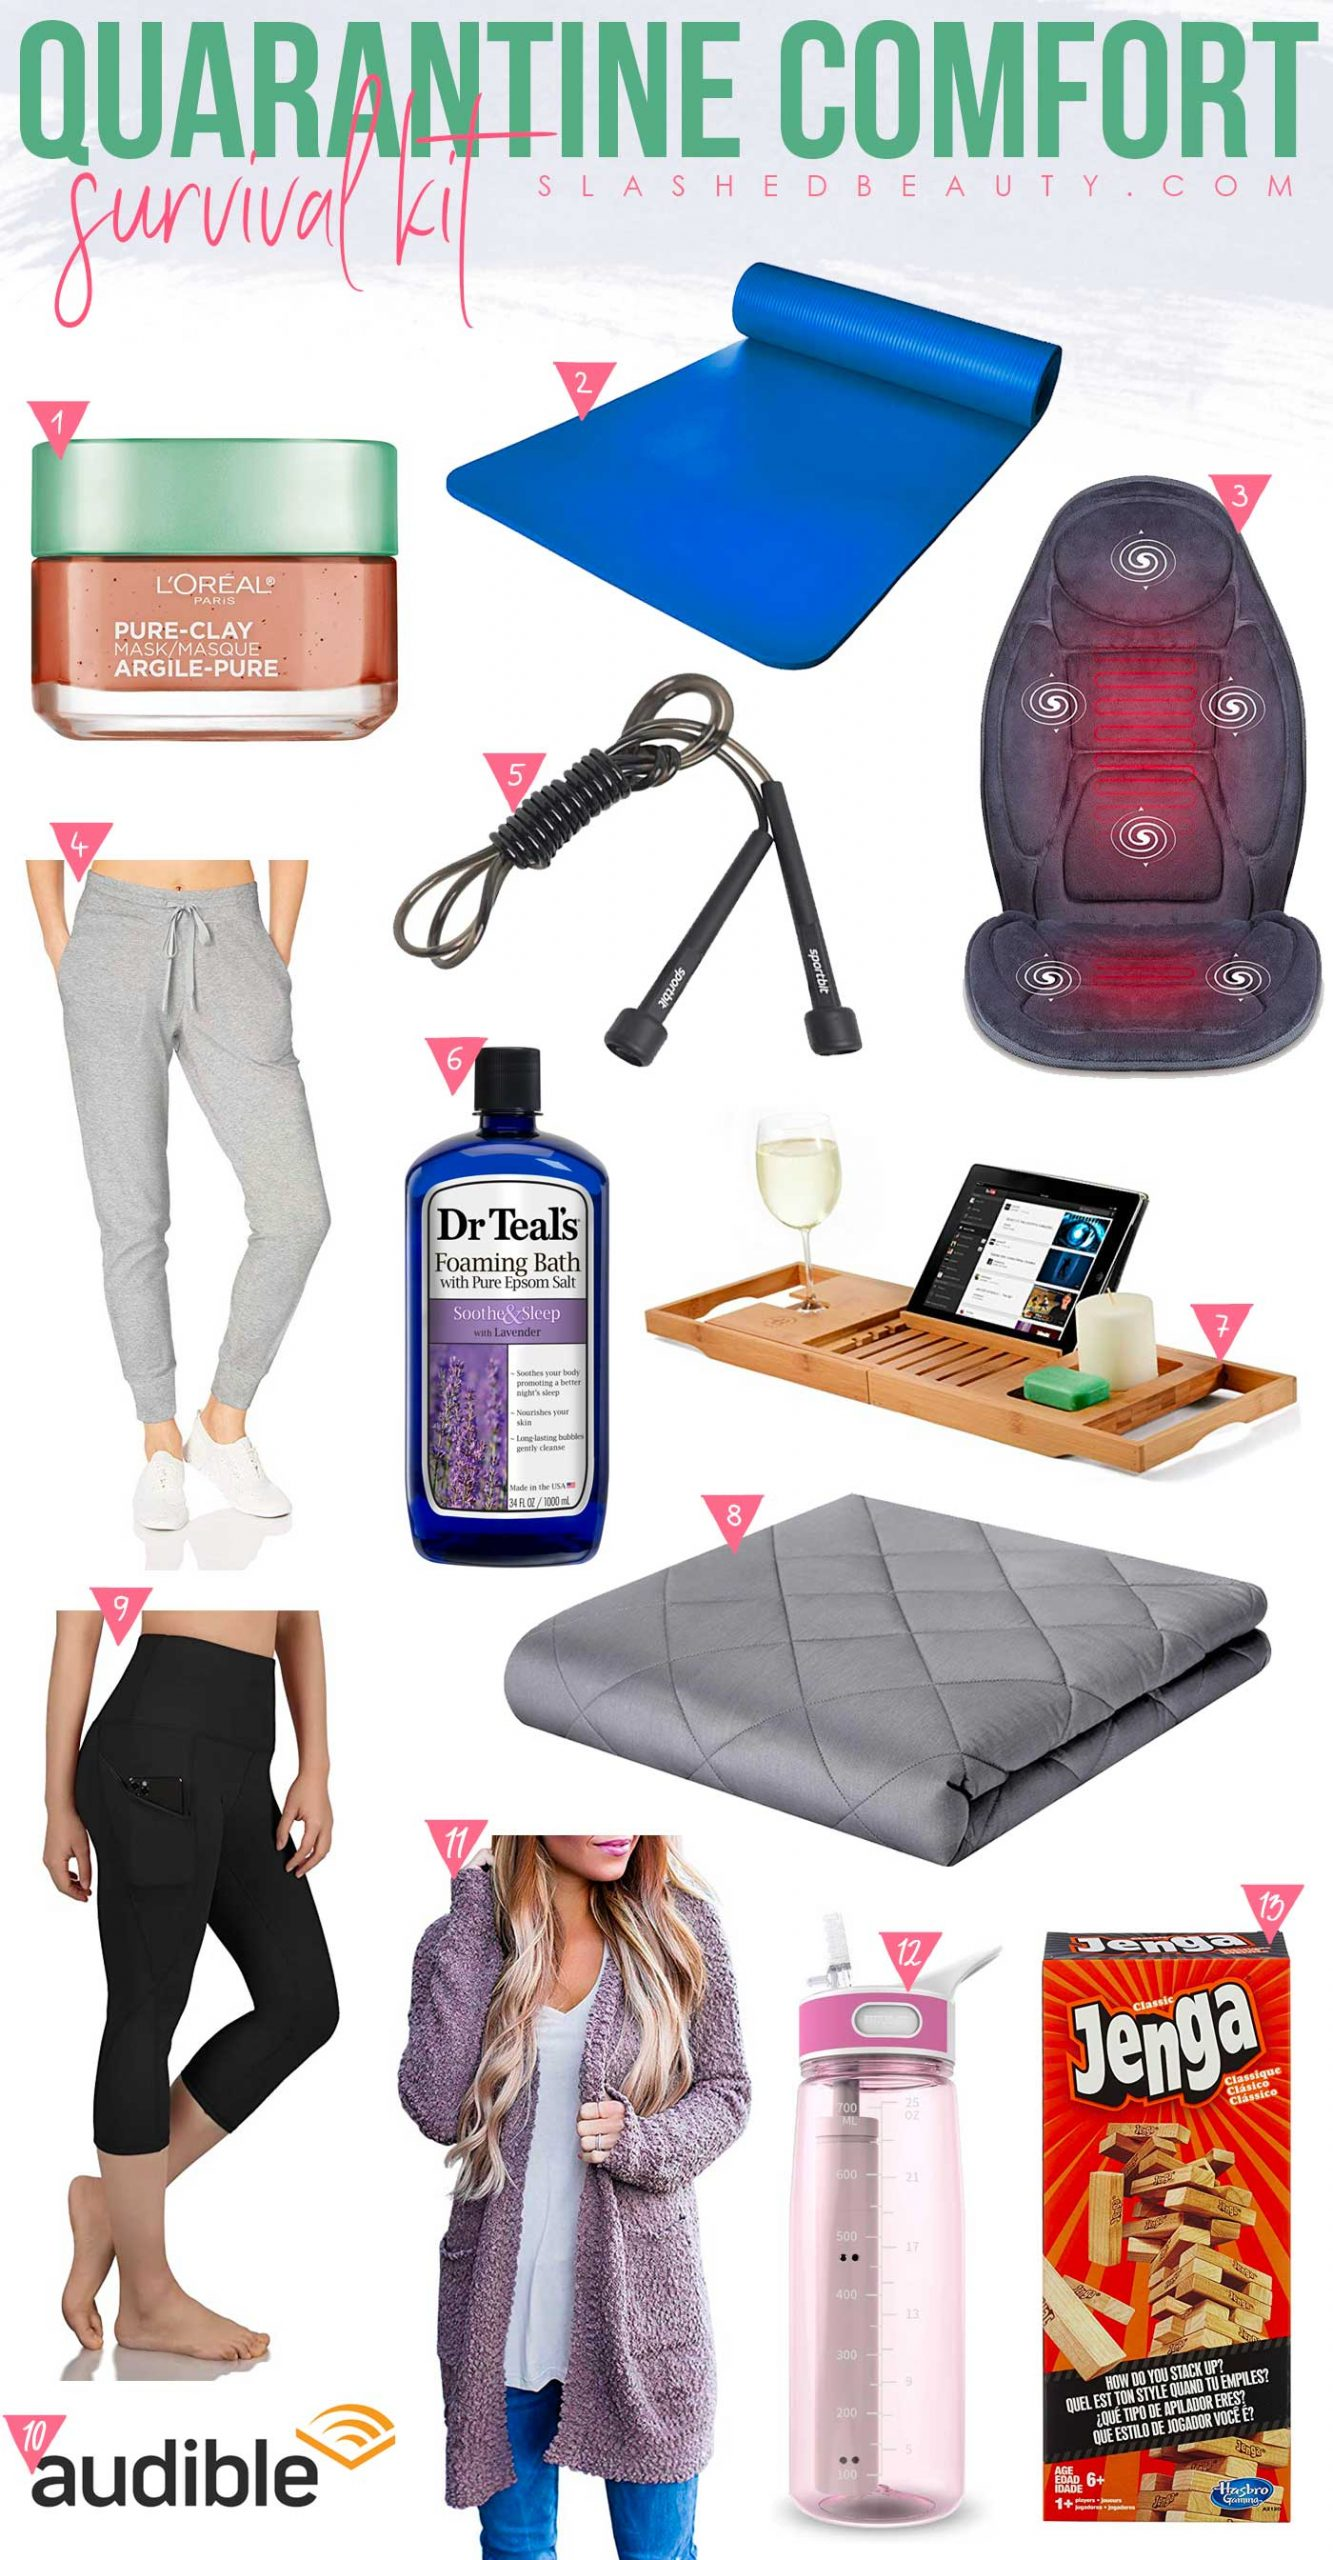 Quarantine Survival Kit for Self Care & Comfort | Quarantine Self Care Kit | Slashed Beauty